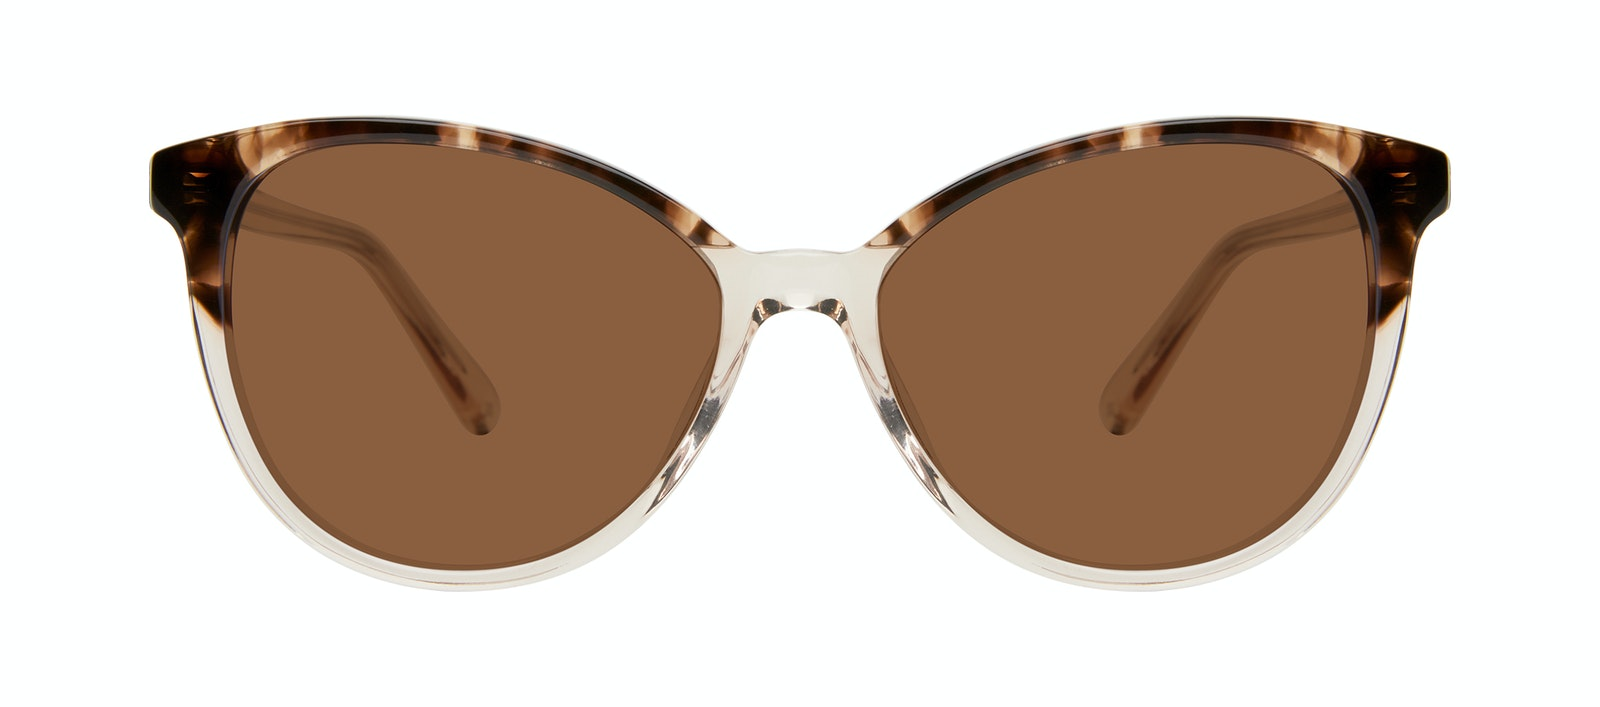 Affordable Fashion Glasses Cat Eye Sunglasses Women Esprit L Golden Tortoise Front